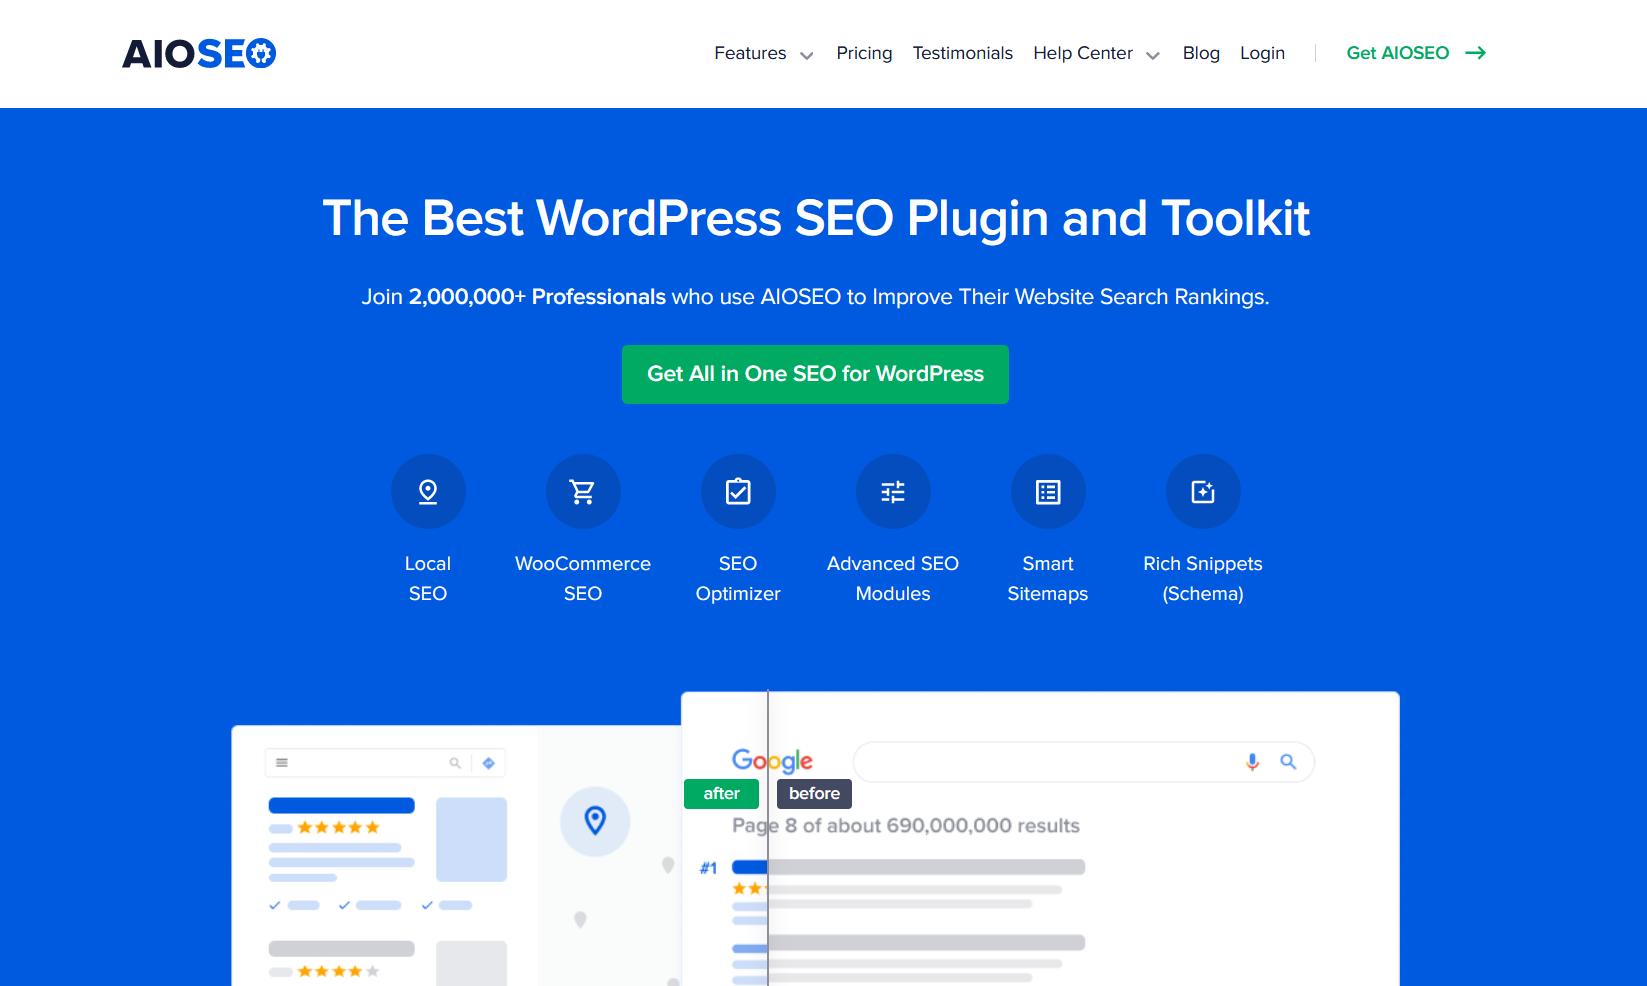 All in One SEO plugin us the best WordPress SEO plugin